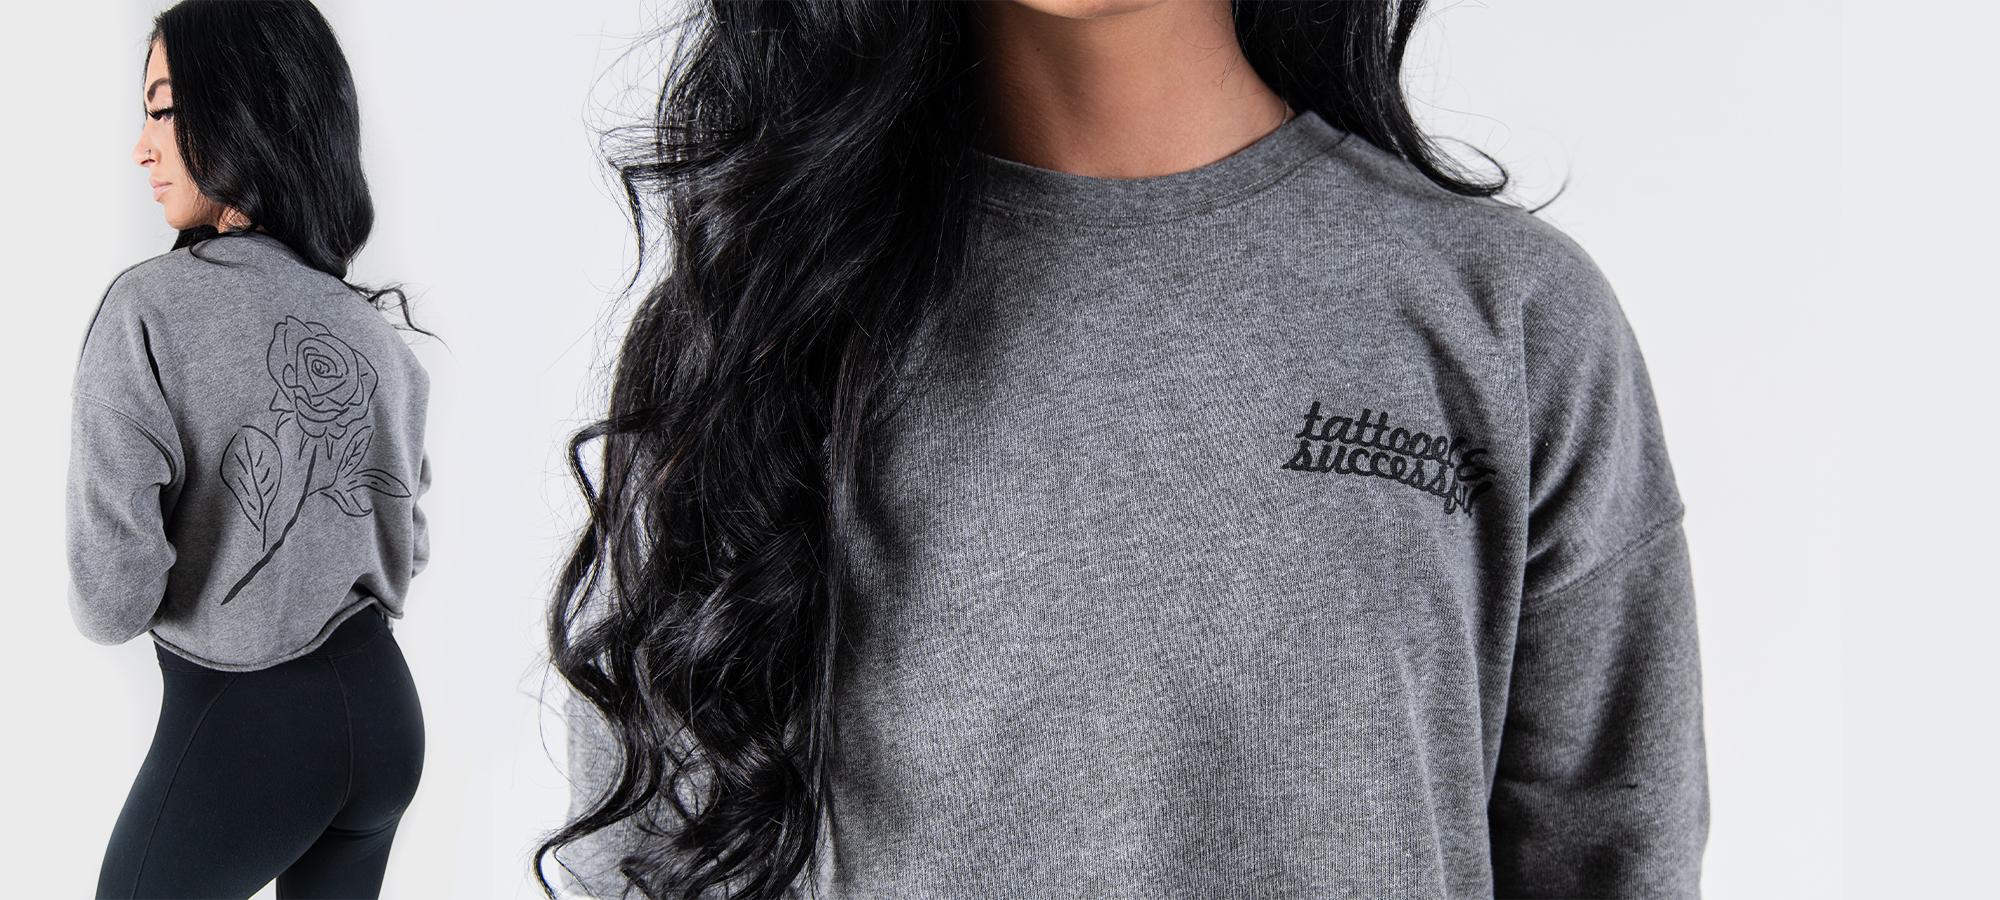 tattooed and successful grey rose sweater